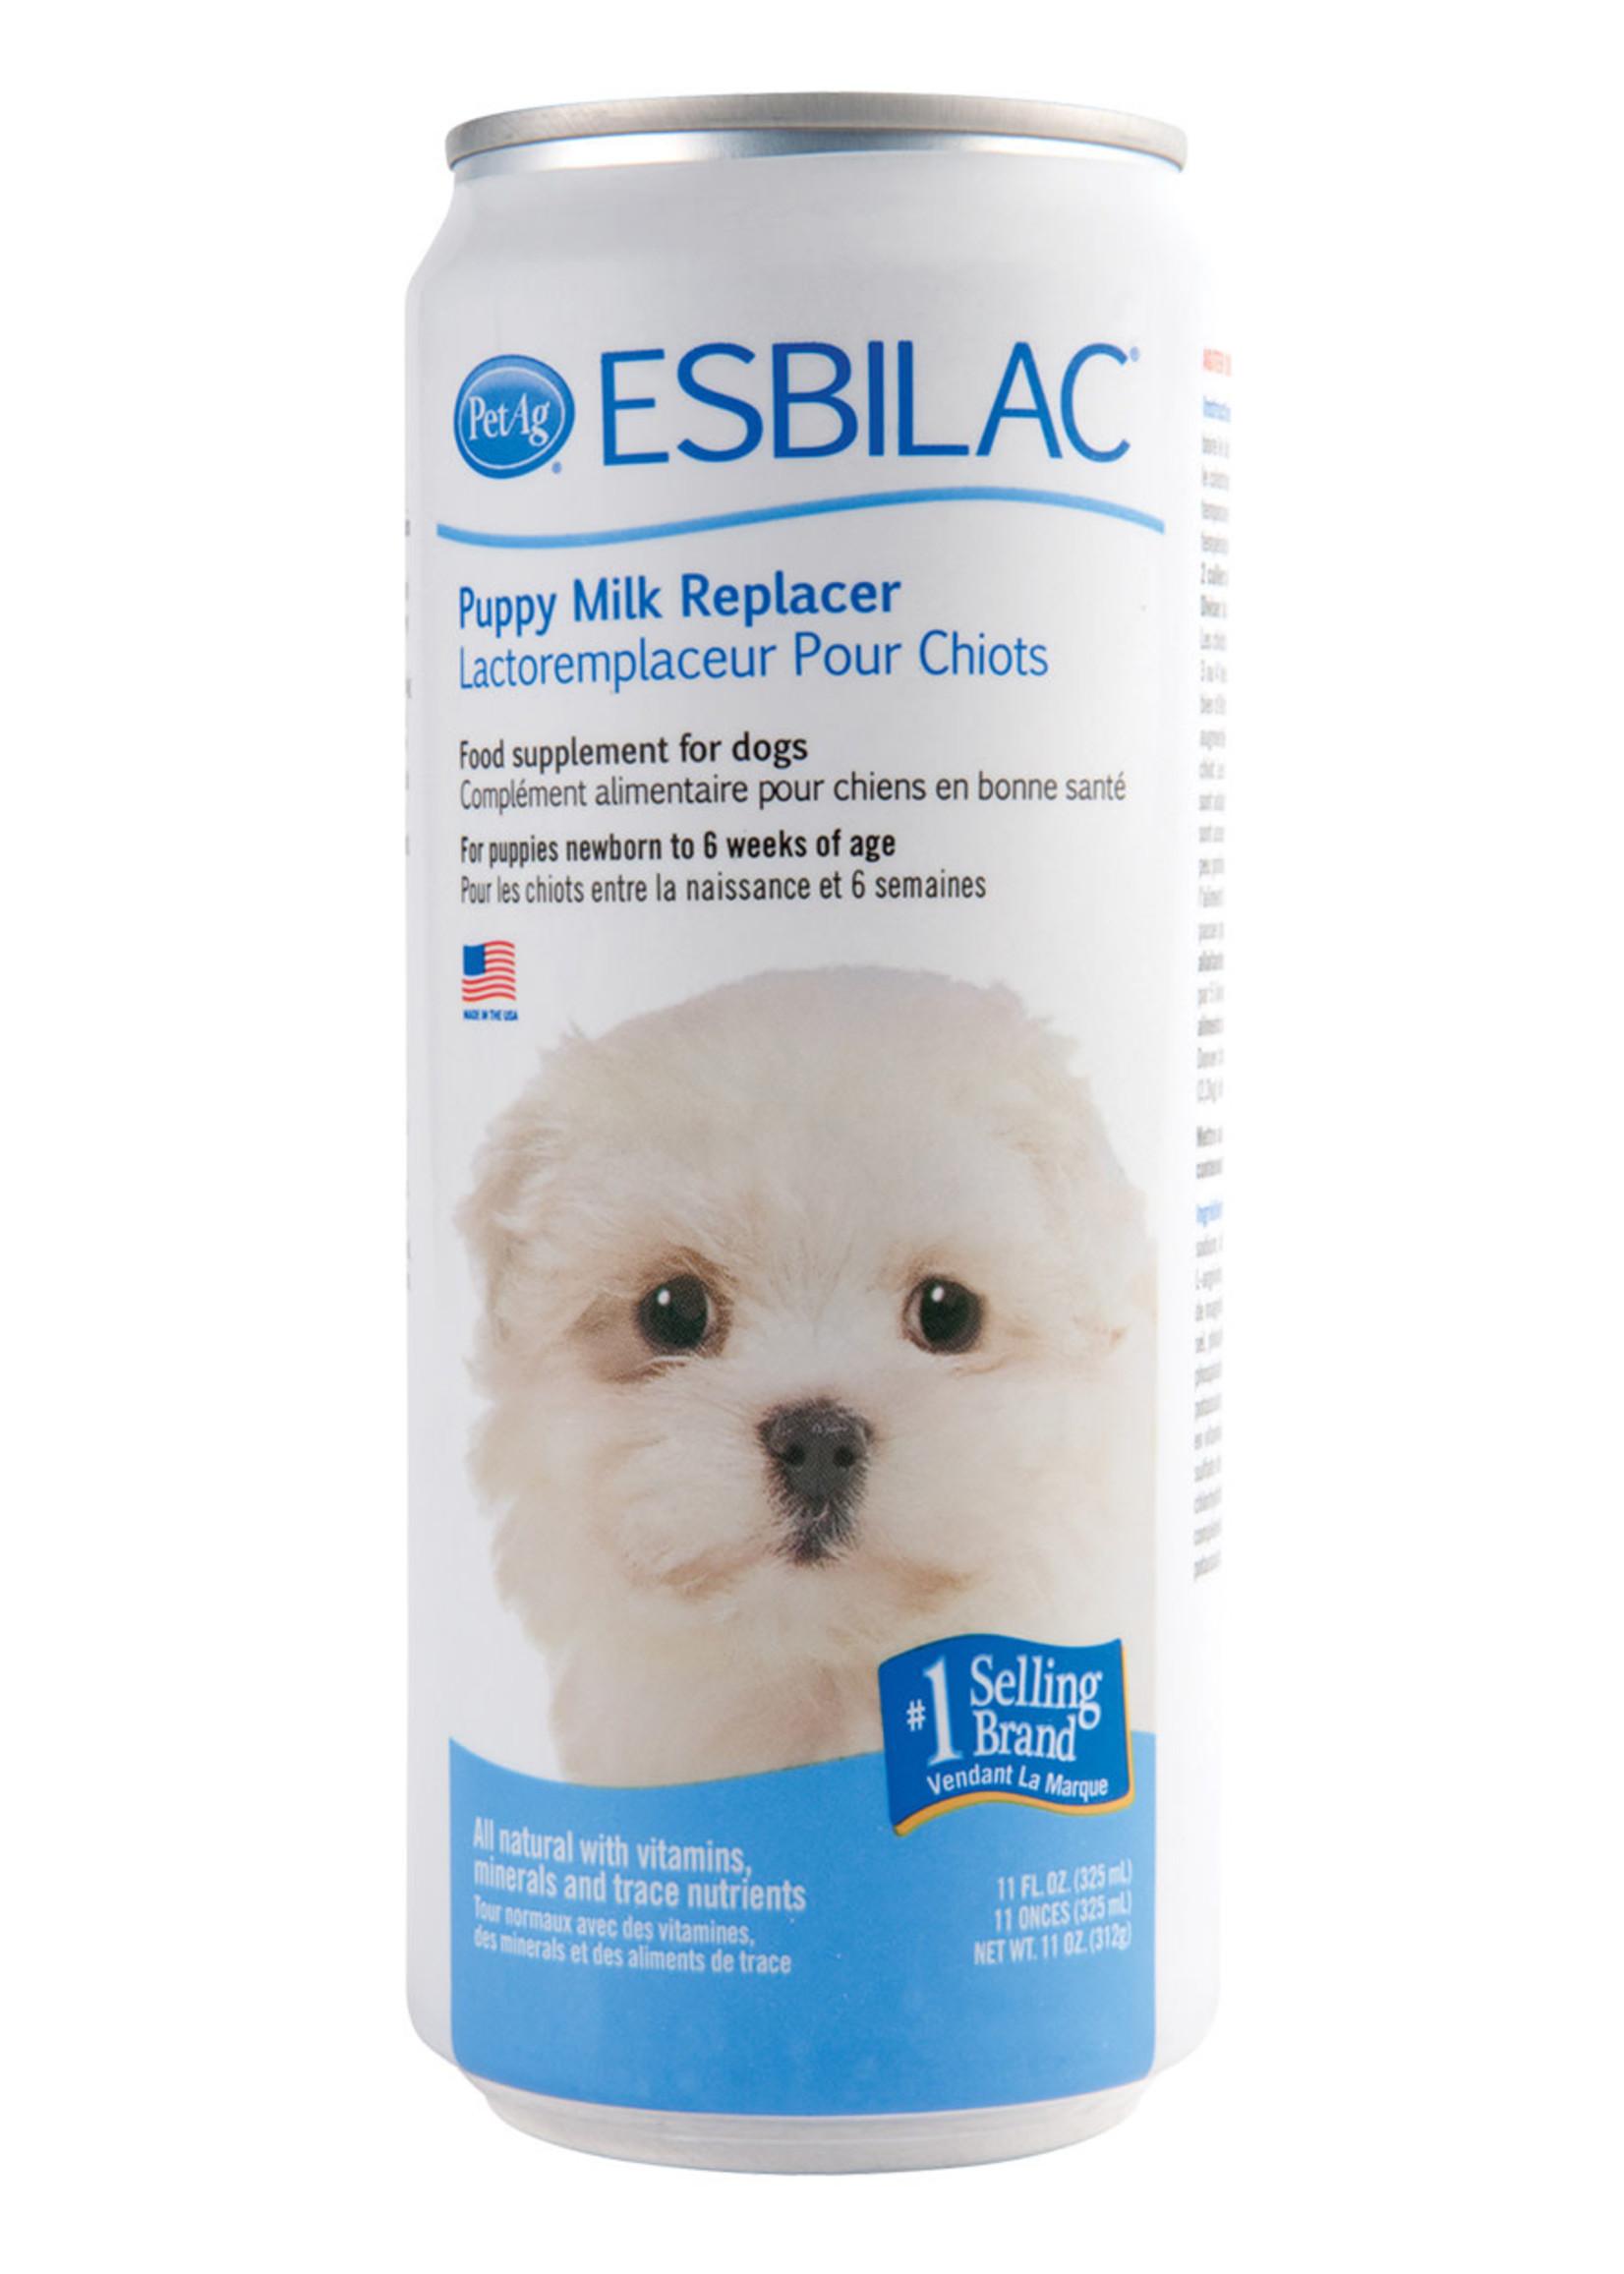 PetAg® ESBILAC LIQUID FOR PUPPIES 11oz